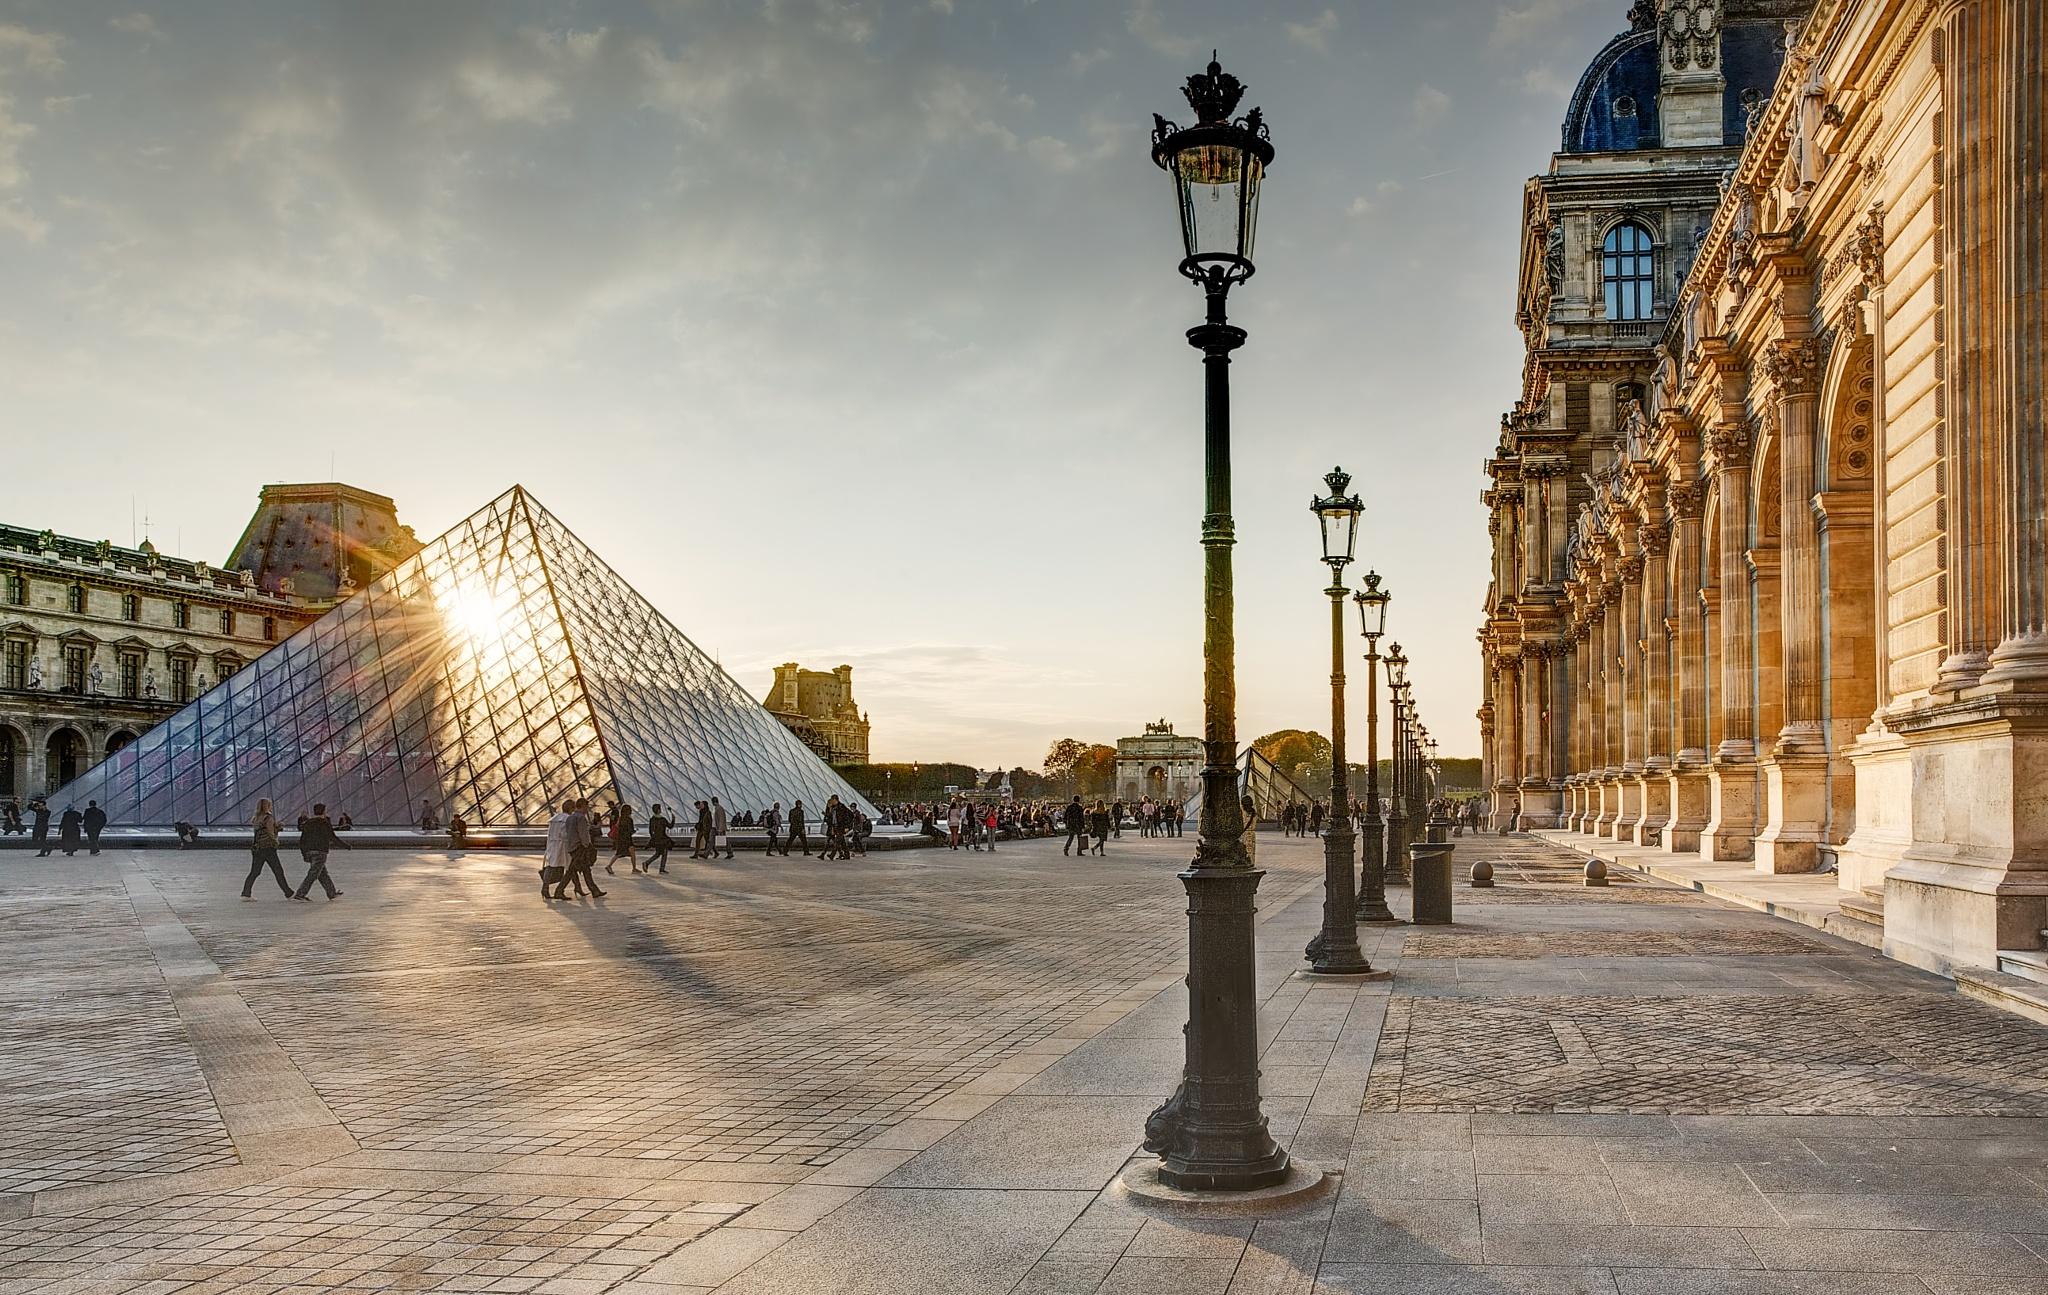 Louvre, Paris by james_nagarbaul